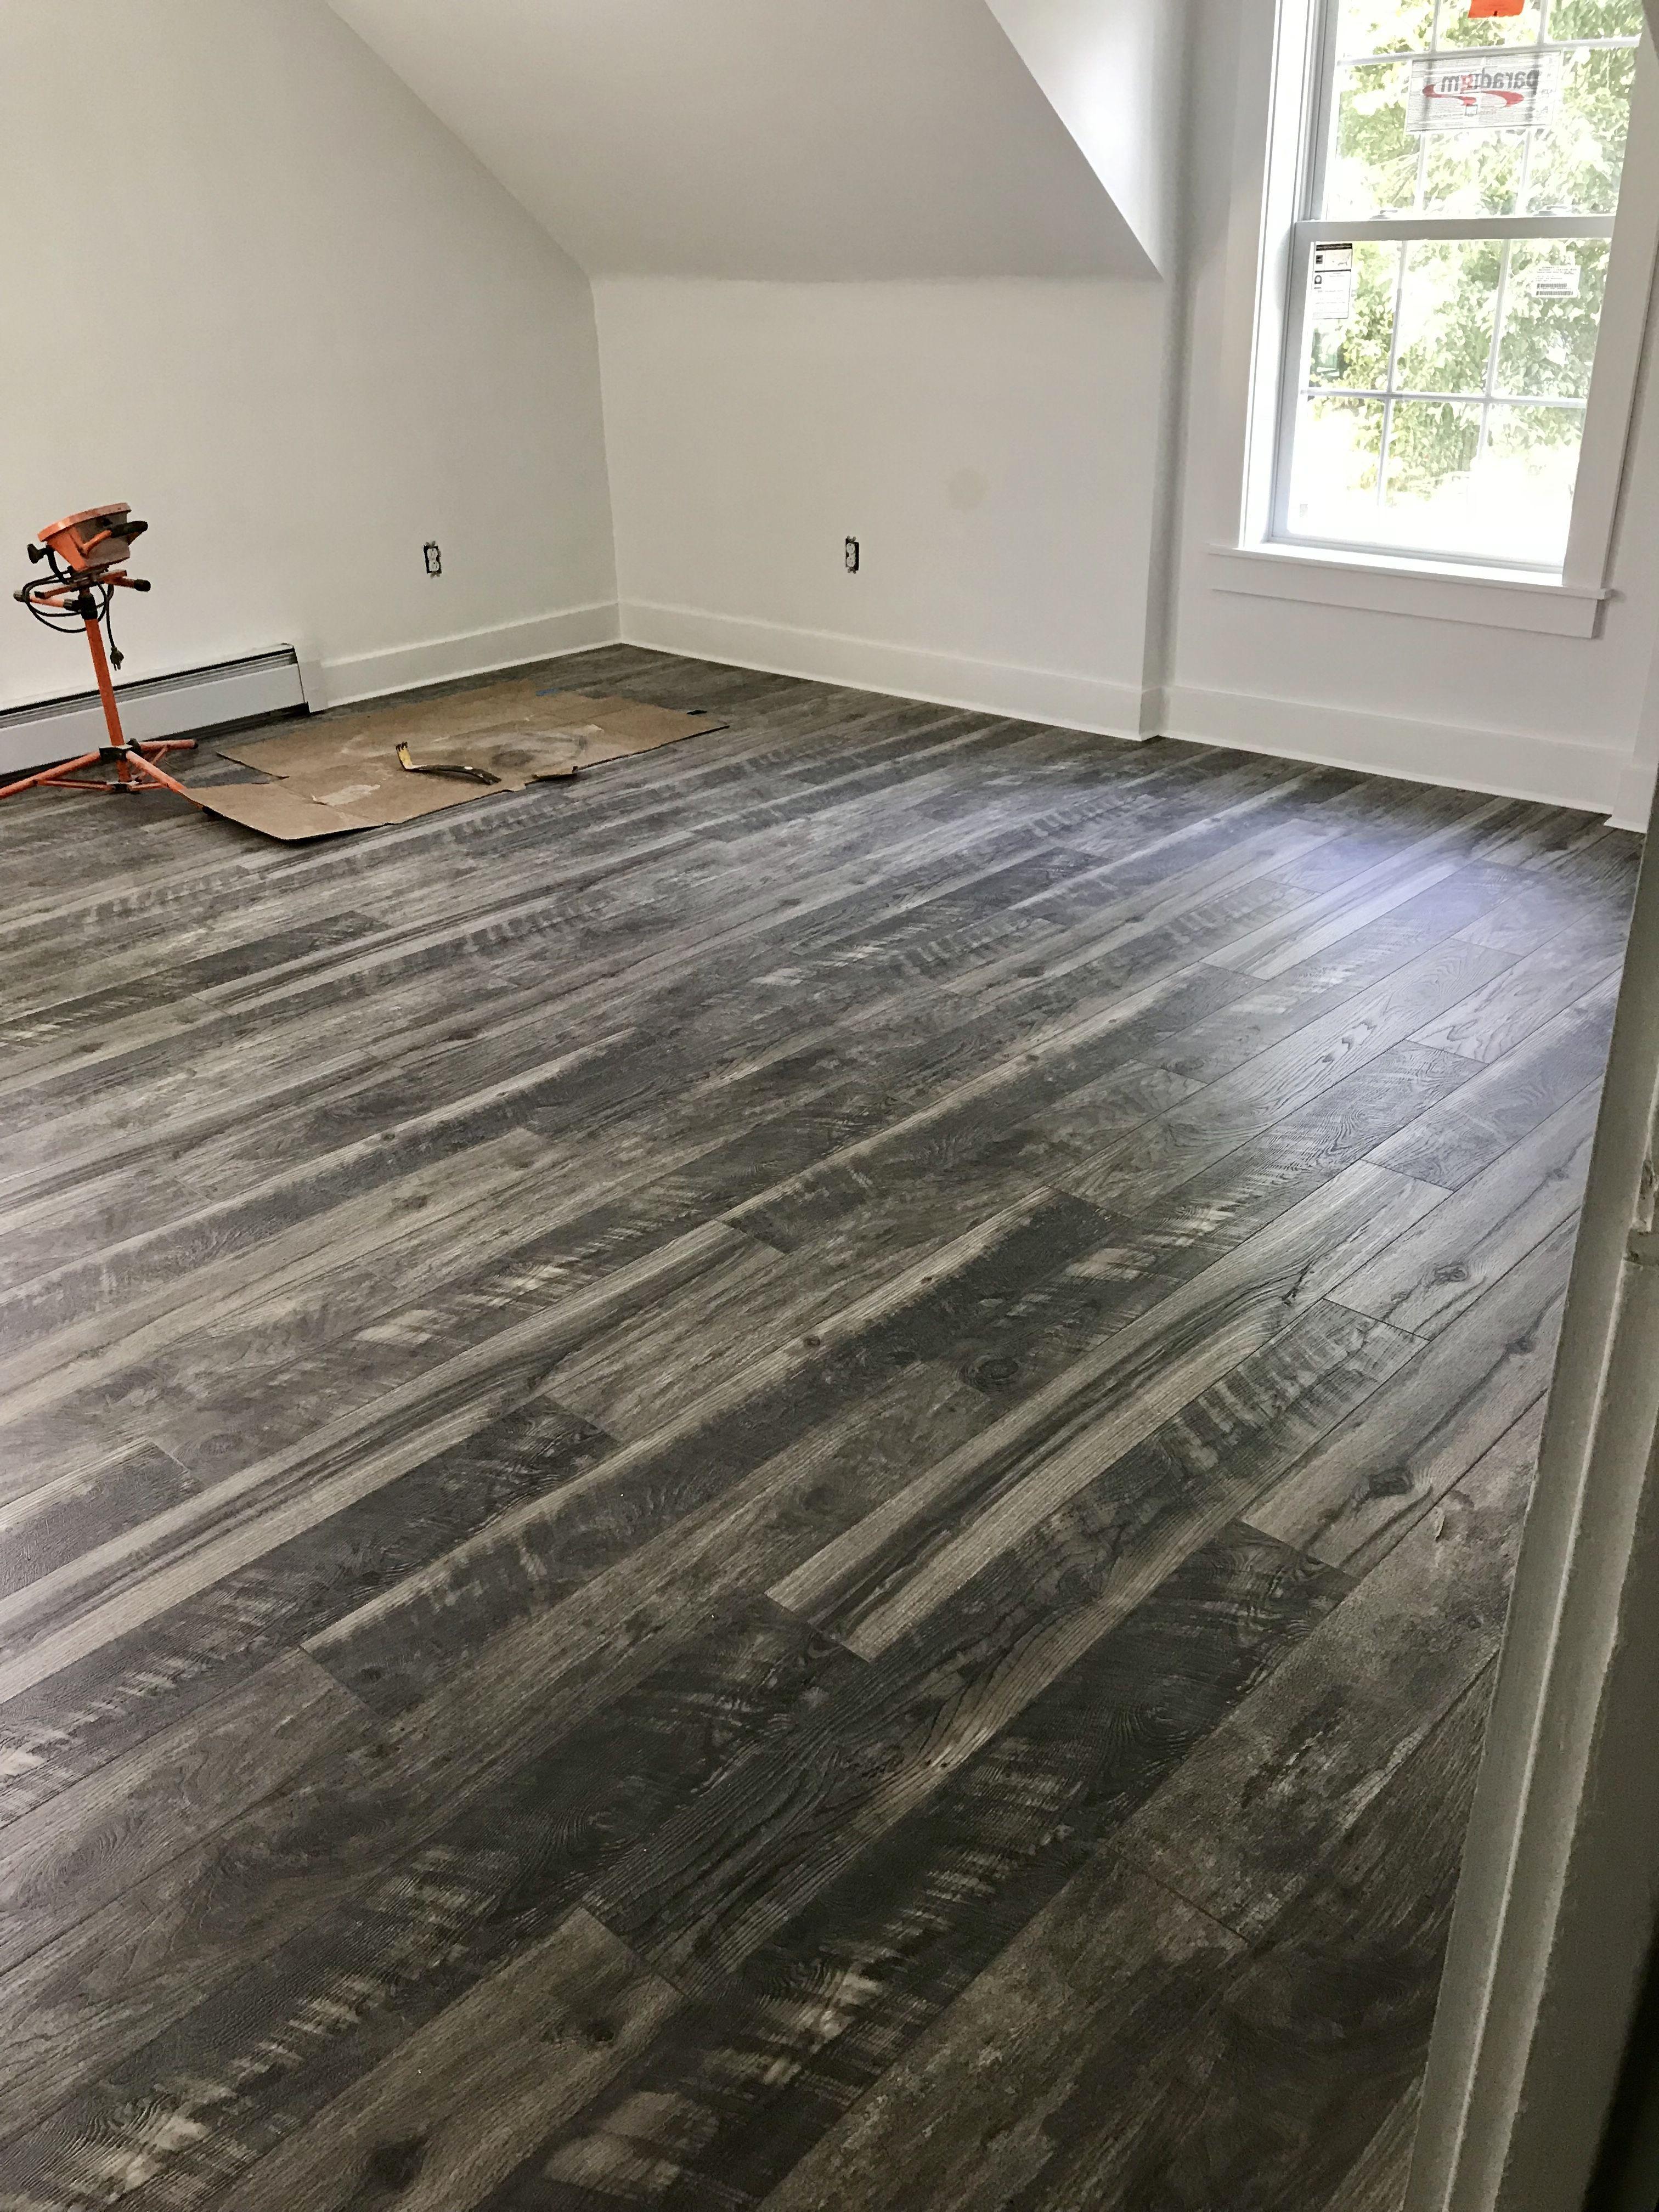 Cinderwood Fusion Laminate Flooring Bedroom Laminate Flooring New House Construction